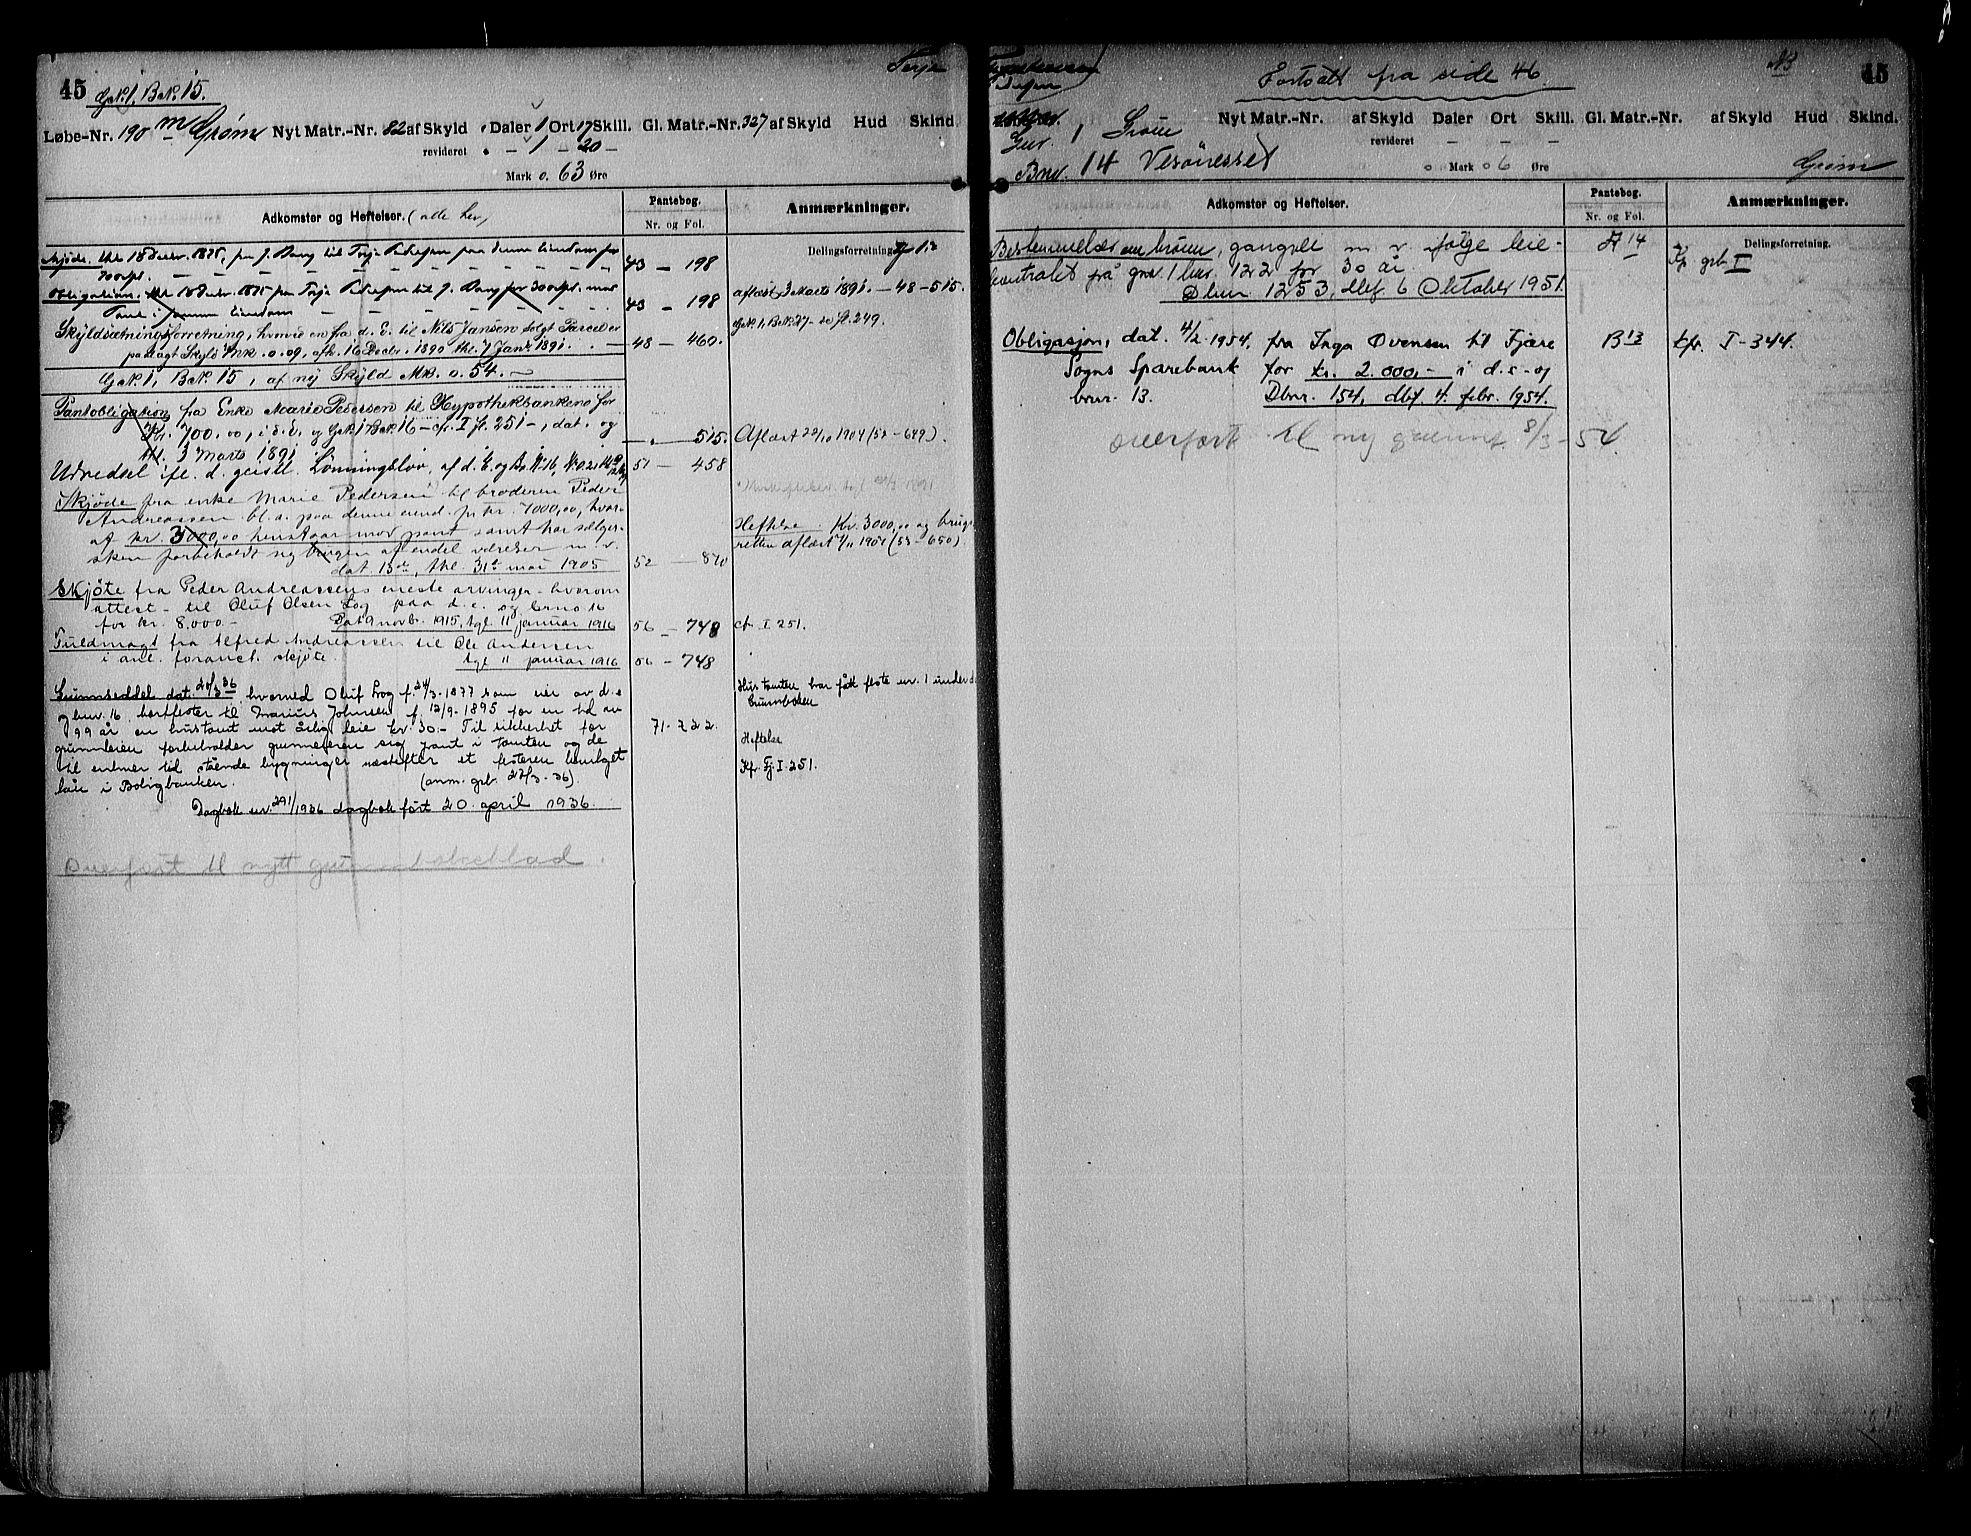 SAK, Vestre Nedenes/Sand sorenskriveri, G/Ga/L0017: Panteregister nr. 13a, 1872-1956, s. 45